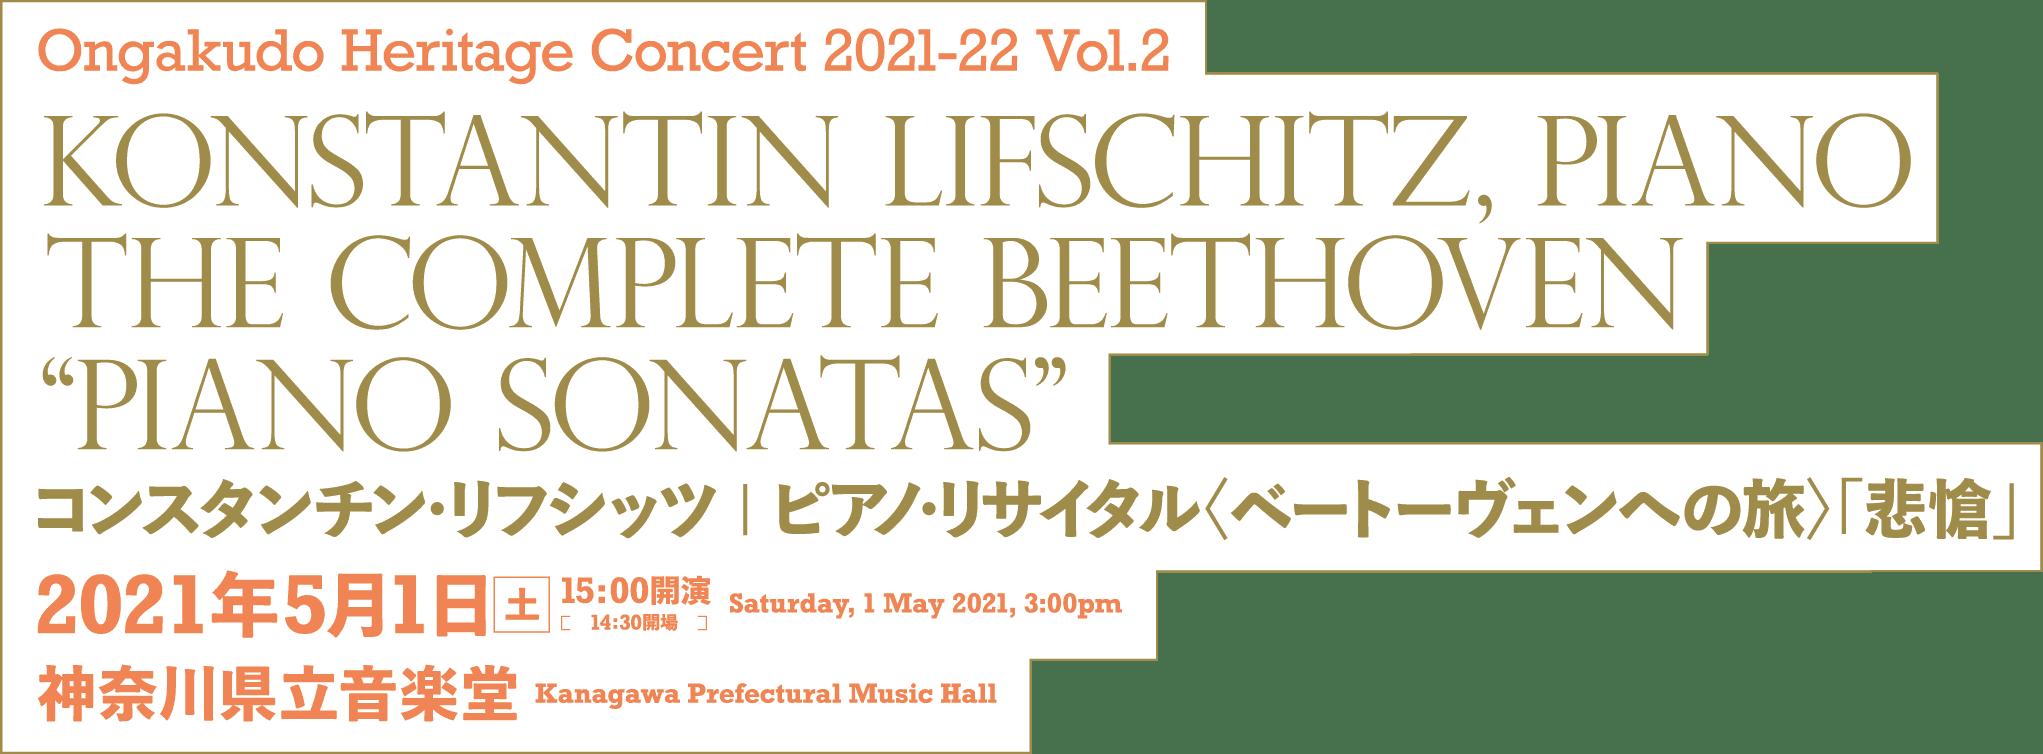 "Ongakudo Heritage Concert 2021-22 Vol.2 Konstantin Lifschitz, Piano The Complete BEETHOVEN ""Piano Sonatas"